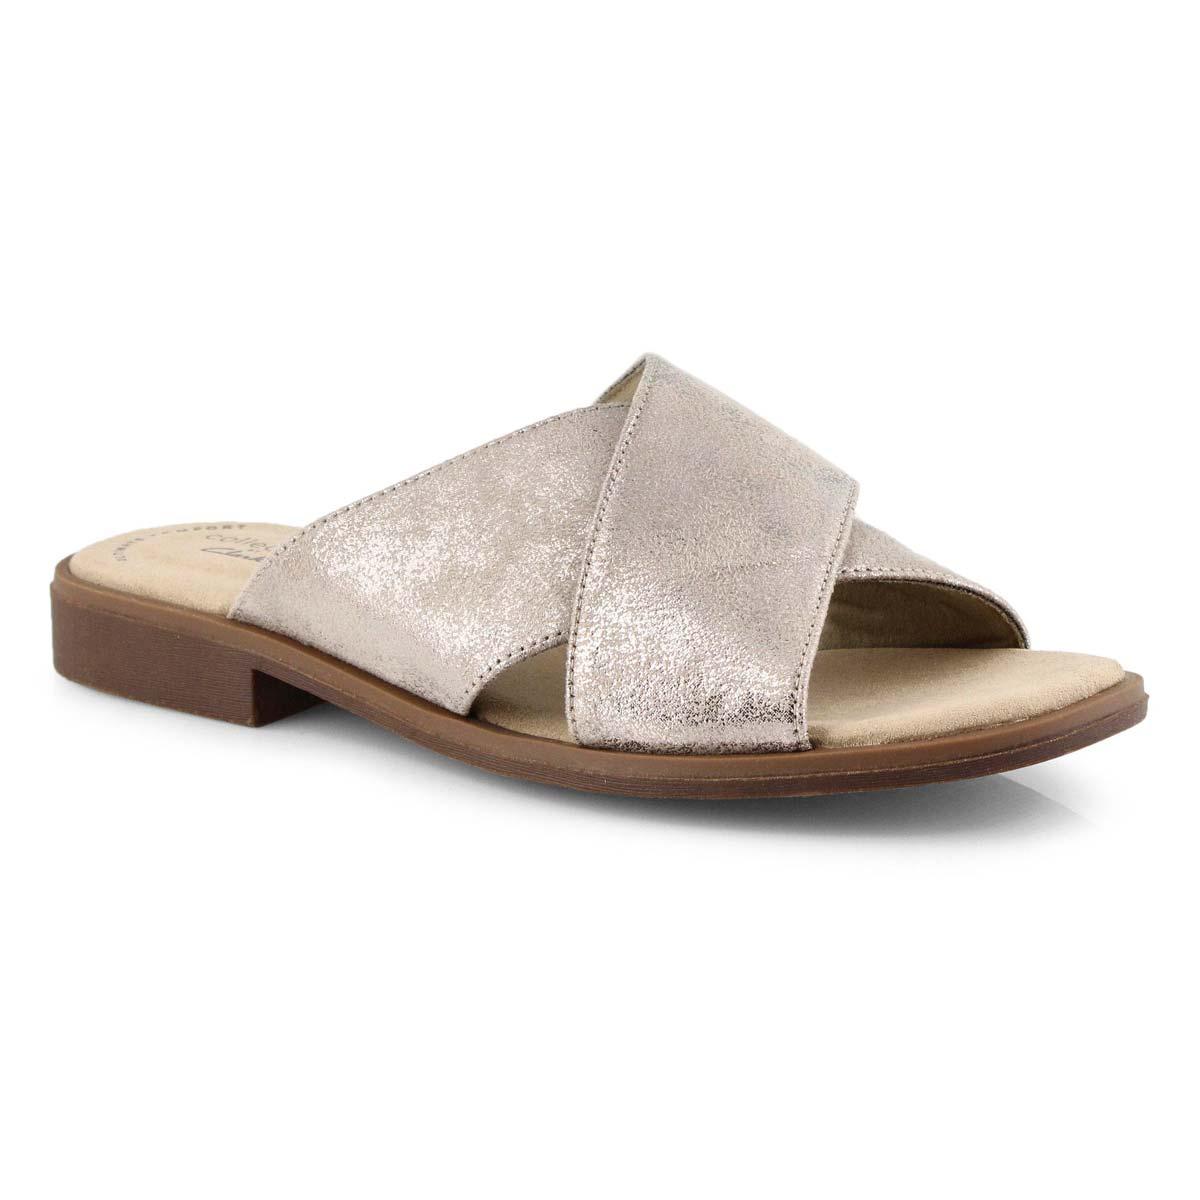 Lds Declan Ivy pewter slide sandals